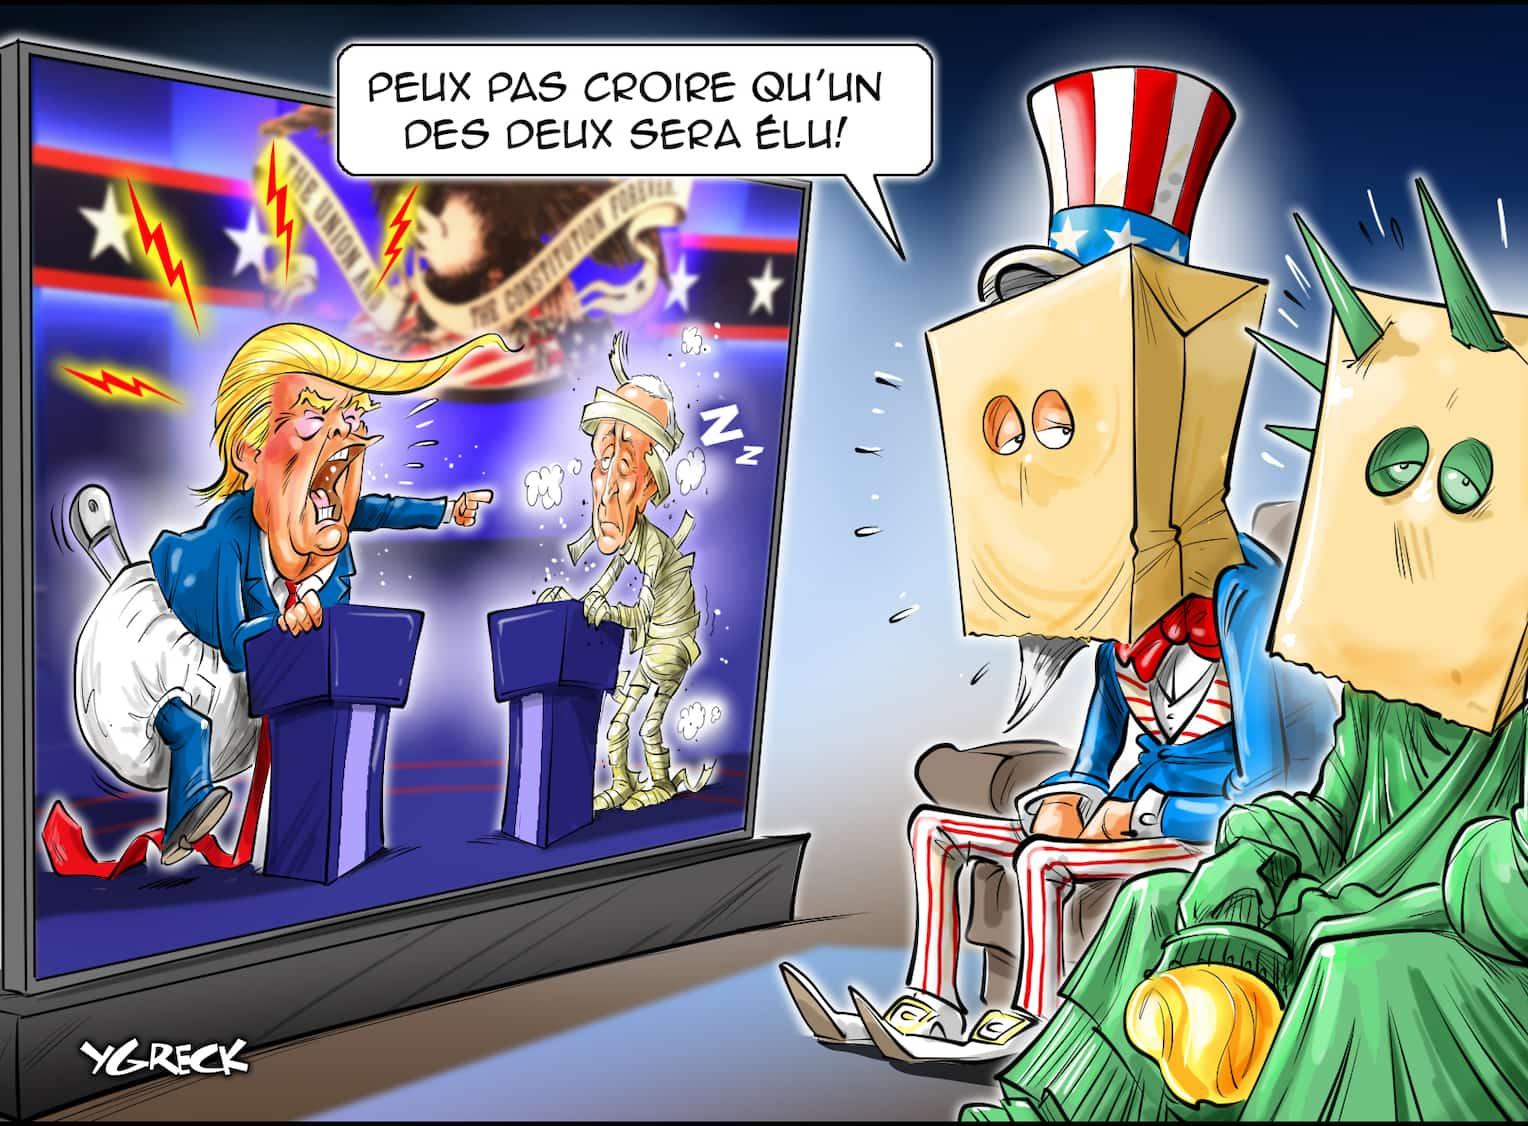 CARICATURES : politiques, judiciaires, sportives ... etc.    (suite 2) - Page 13 De_bat_Trump_Biden2571b8cd-37a9-4047-bf5c-4780534e8dc8_ORIGINAL